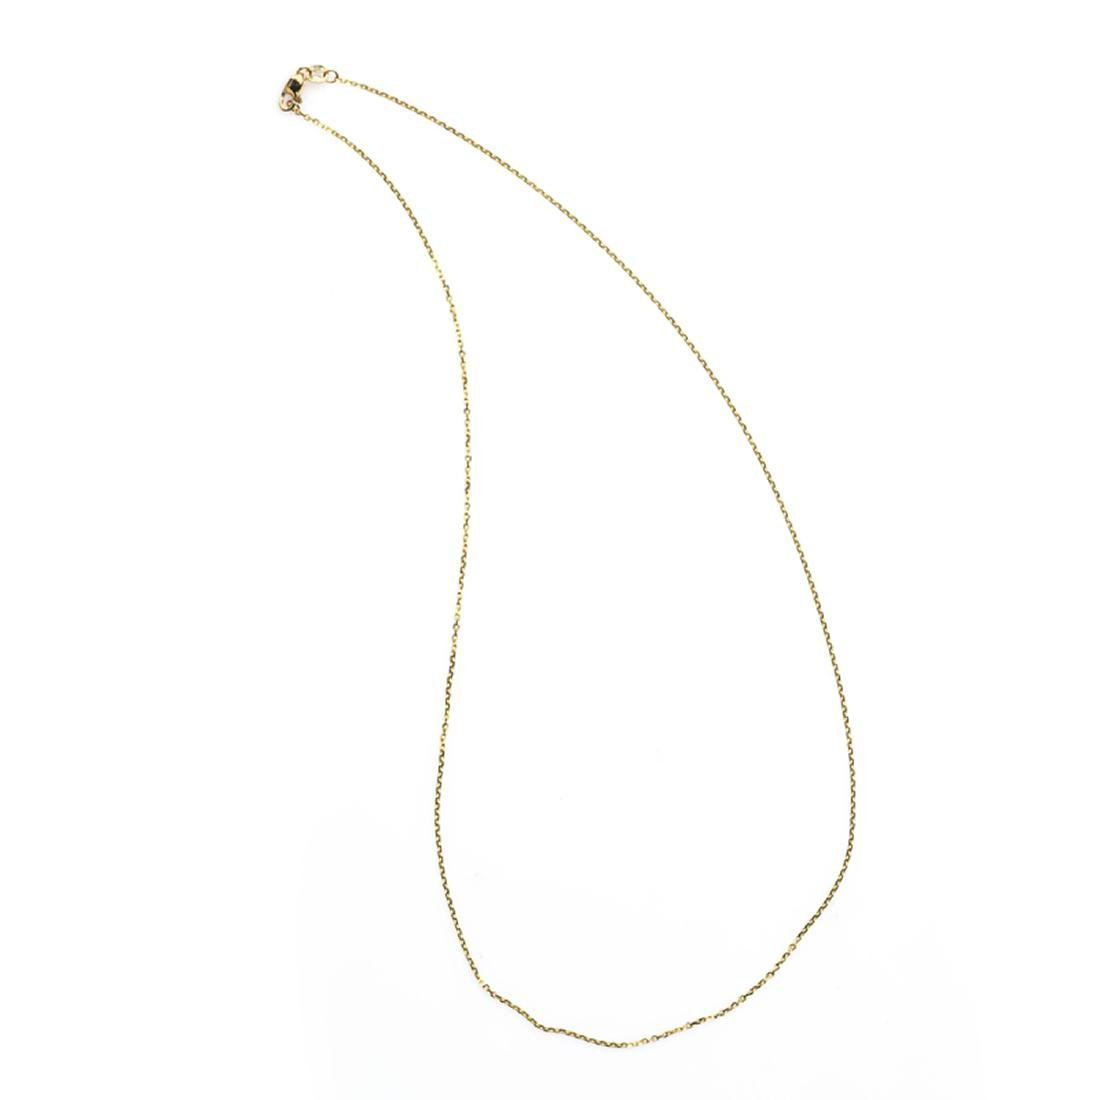 *Fine Jewelry 14 KT Gold, Diamond Cut, 1.8GR. 18''